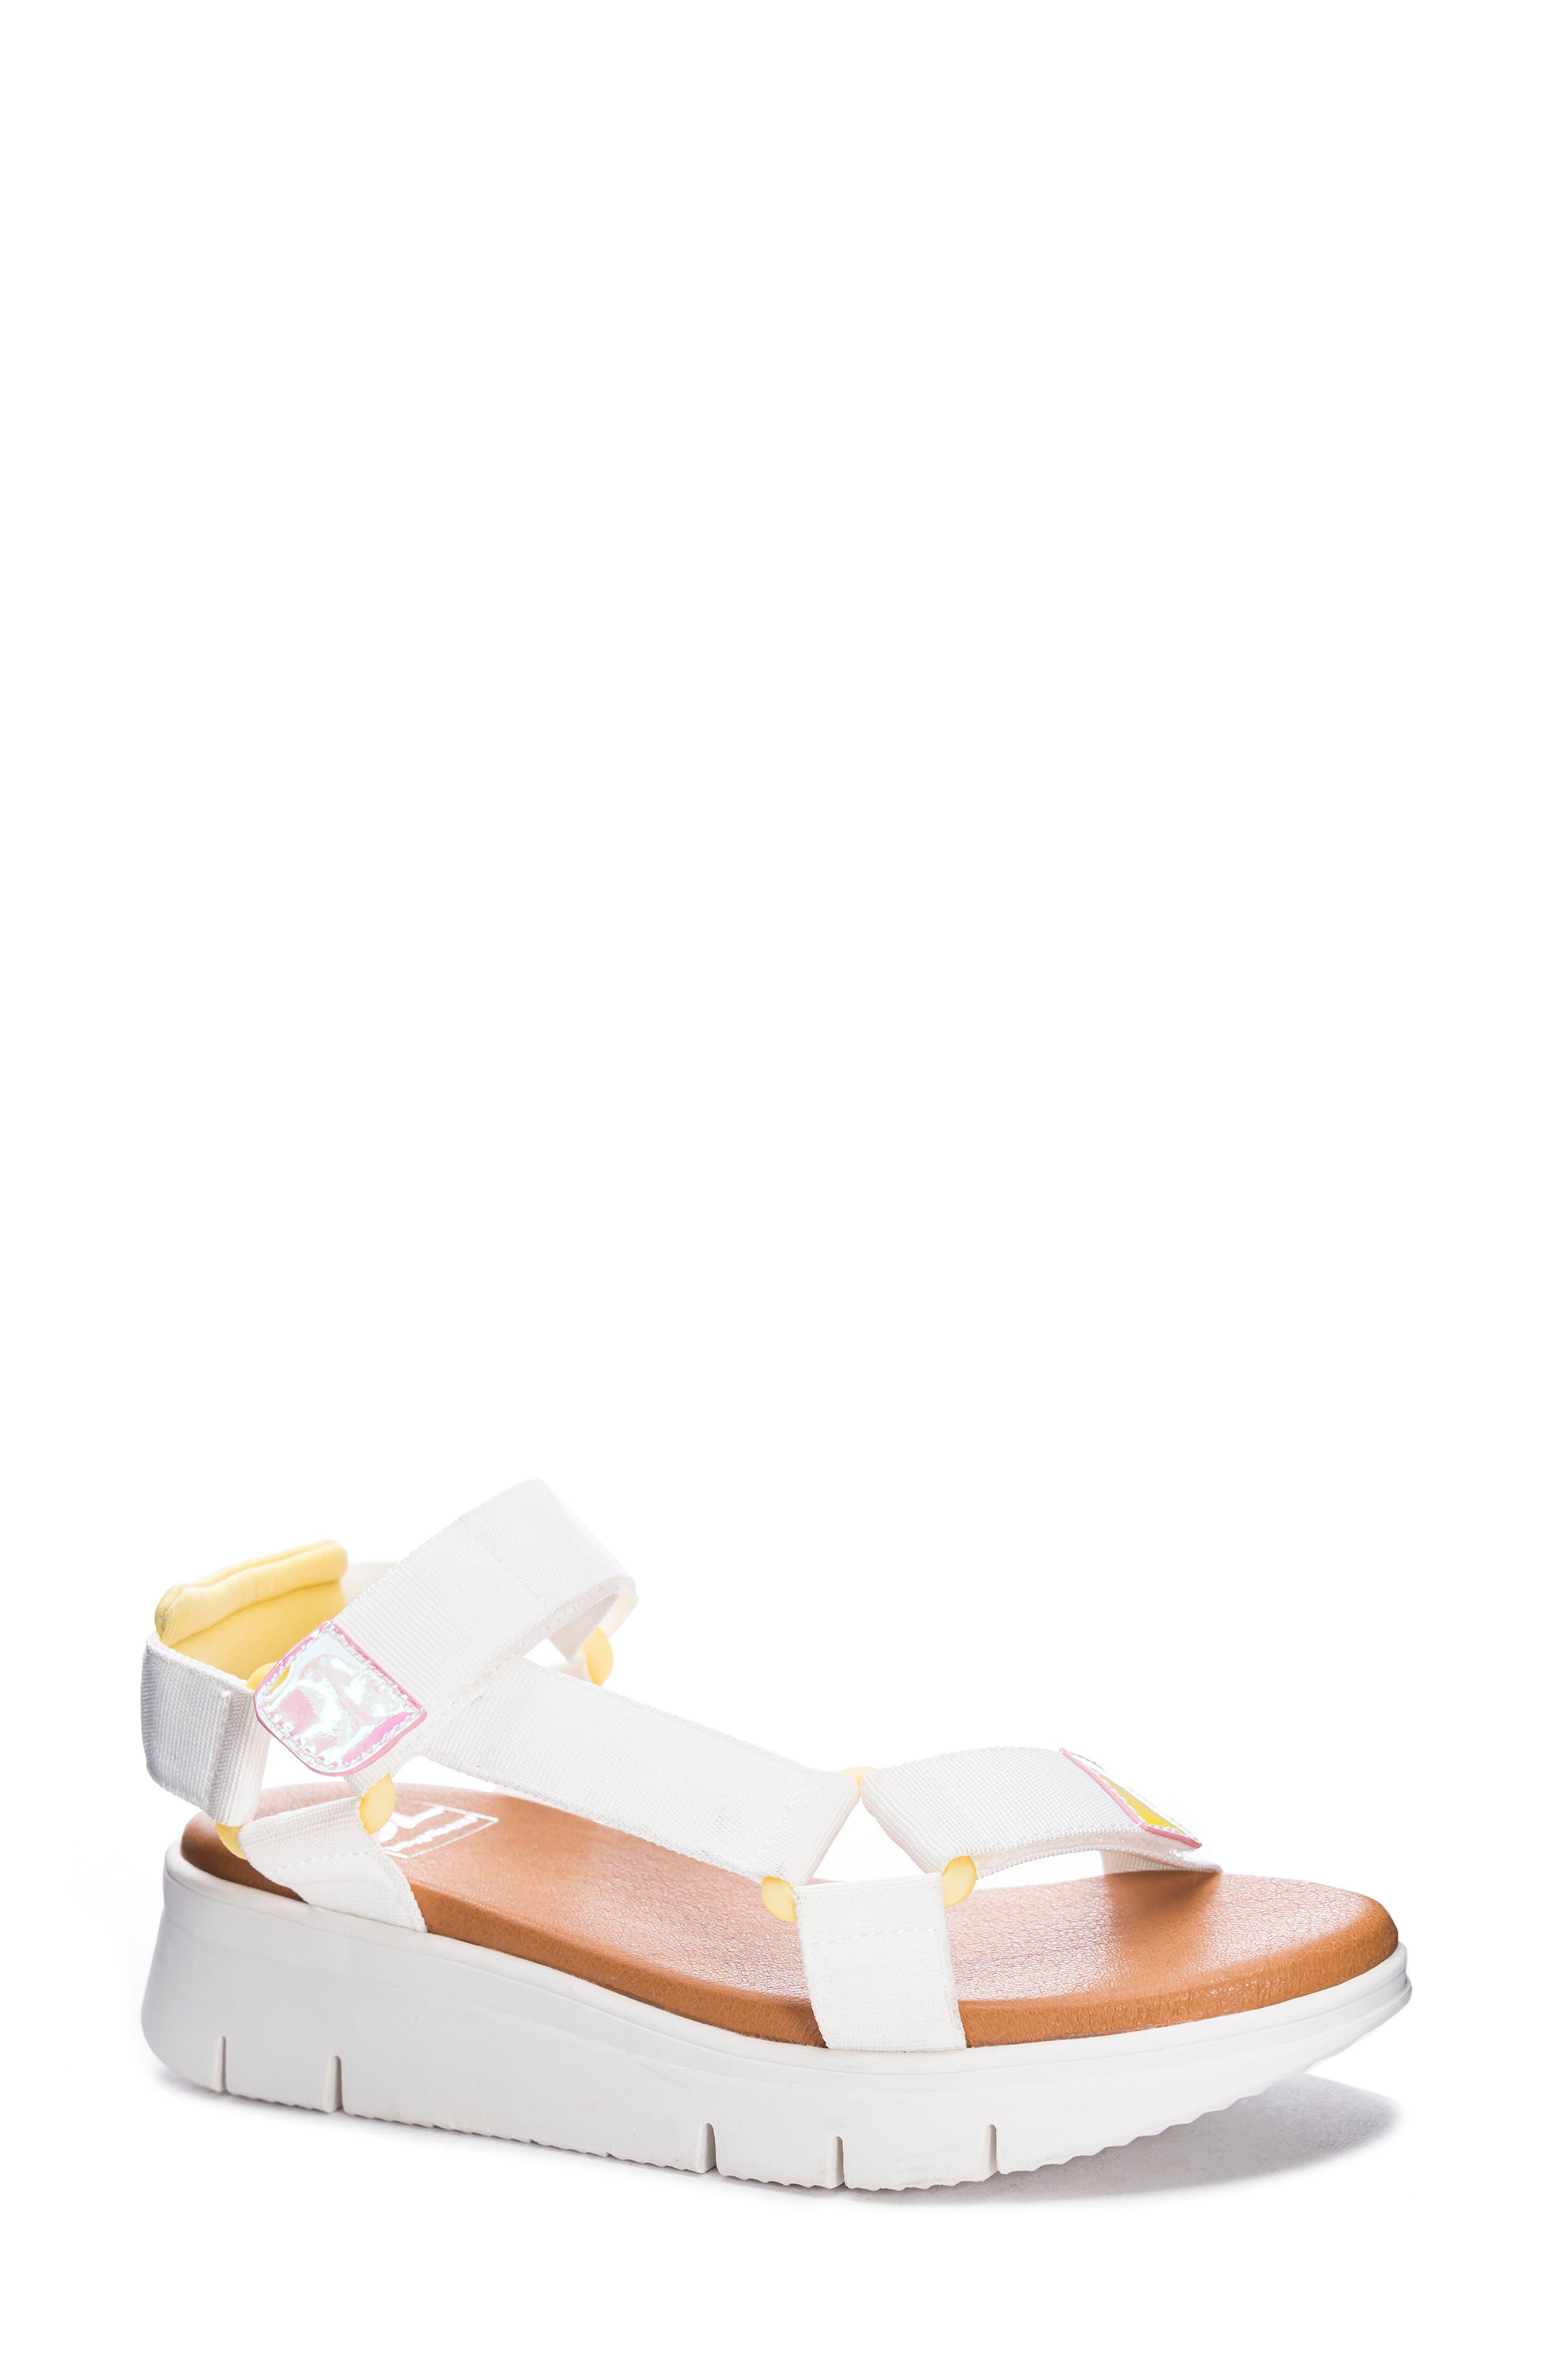 Qwest Strappy Sandal